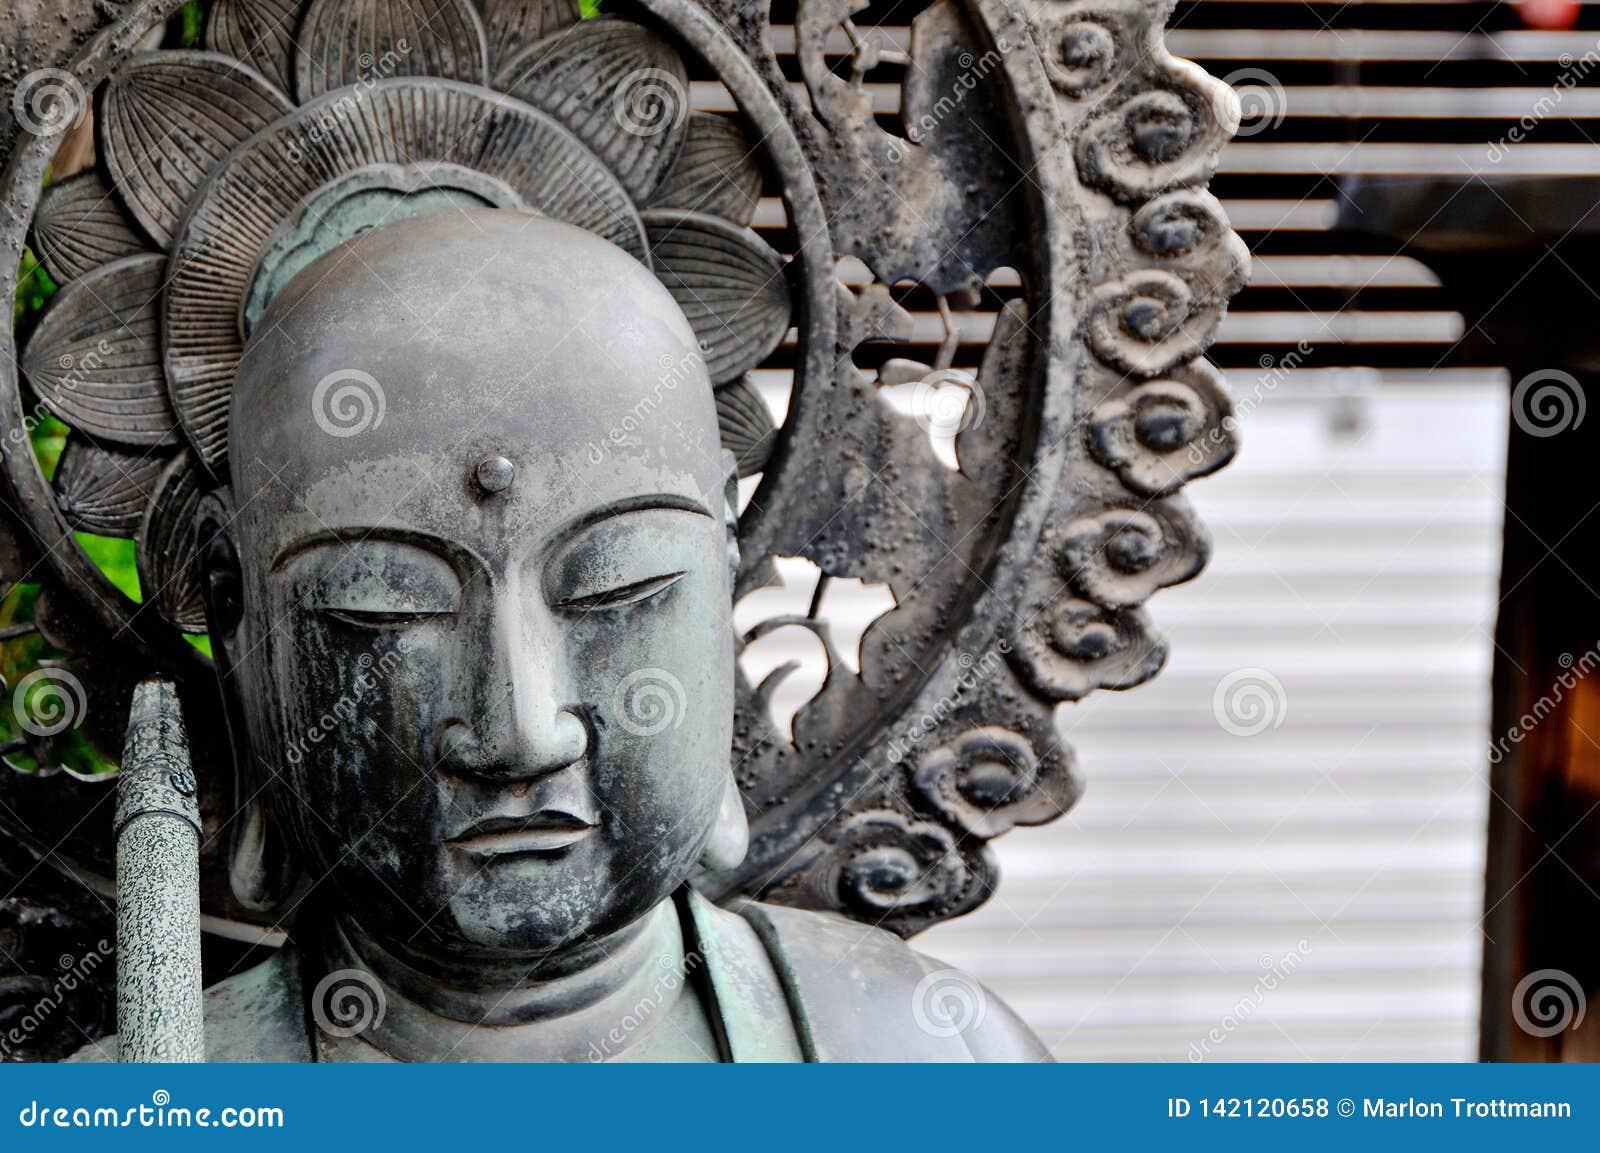 Close up picture of the Jizo Bosatsu statue at the Senso-ji Temple in Tokyo, Japan